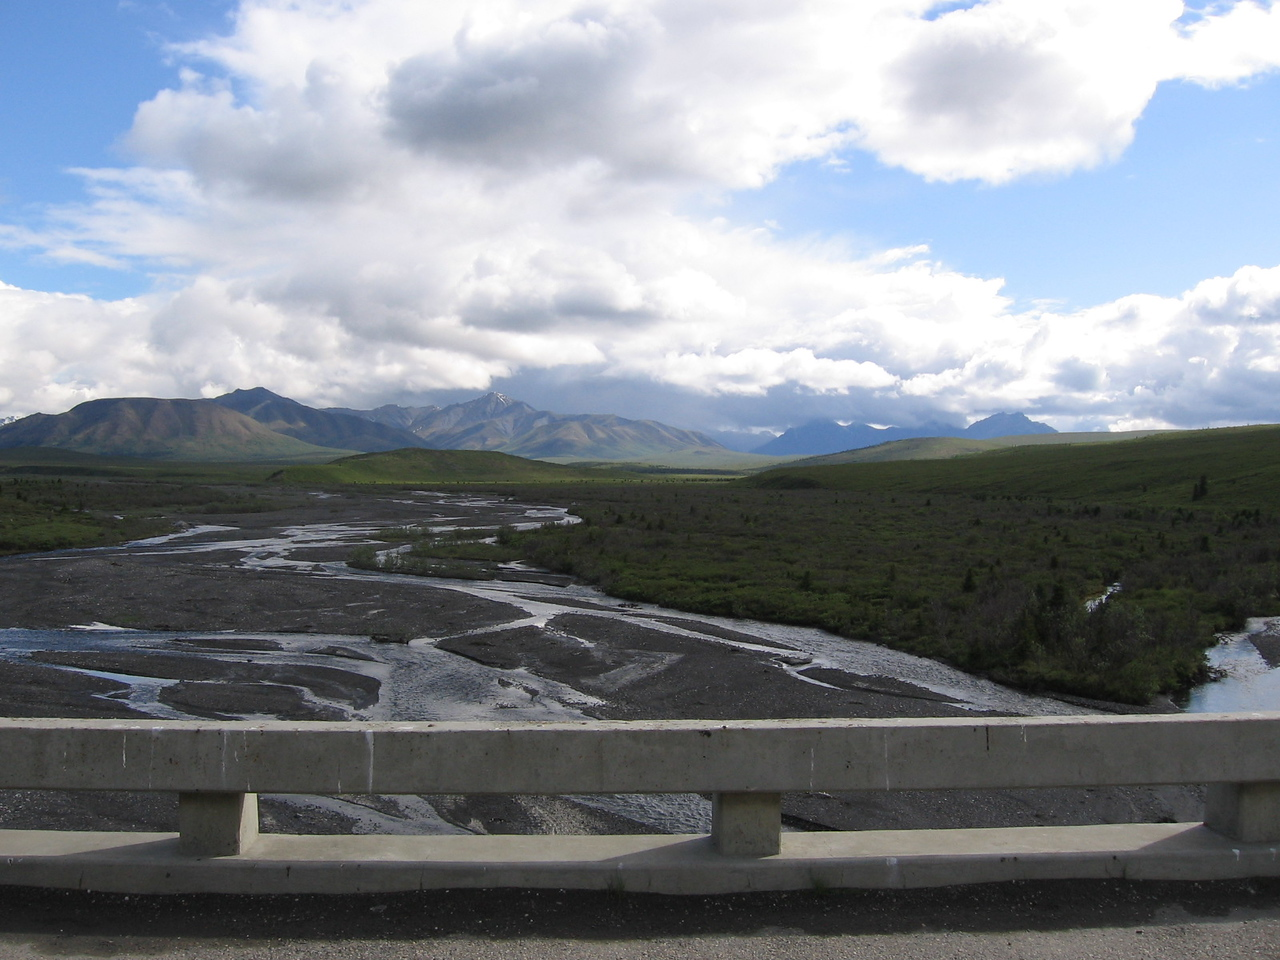 Entering Denali National Park